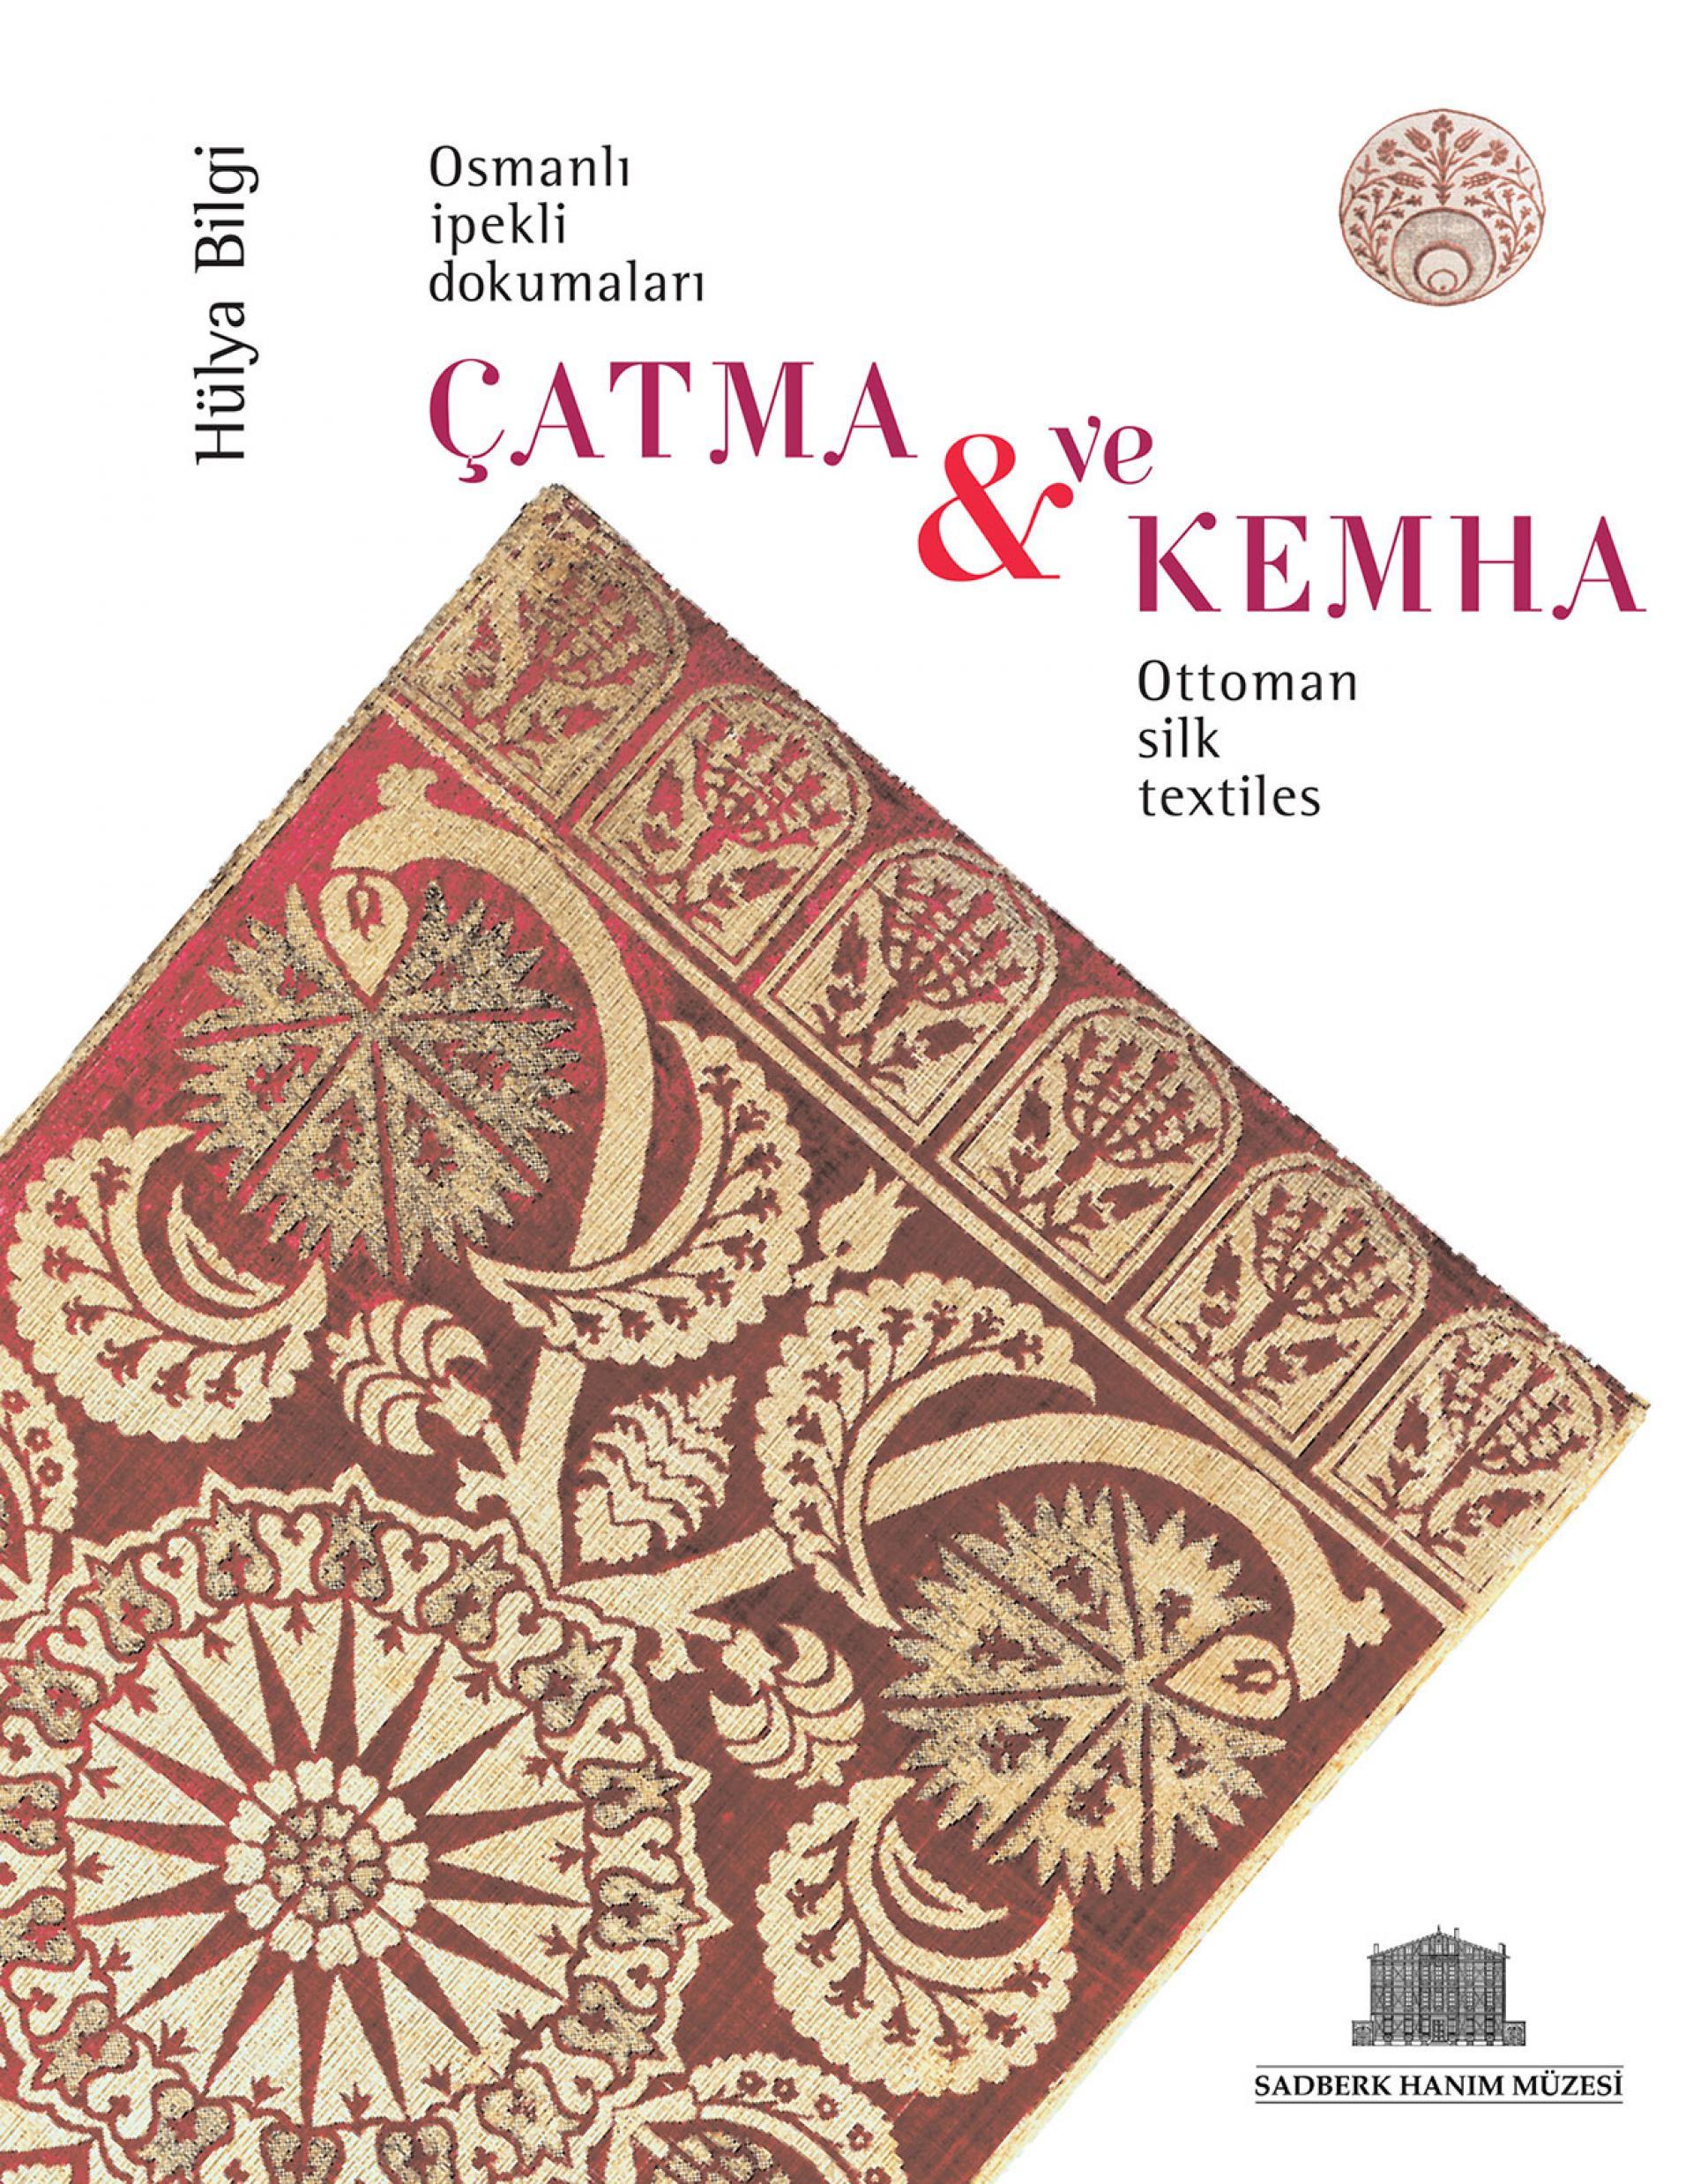 Çatma & Kemha - Ottoman Silk Textiles - BOOKS - Sadberk Hanım Museum